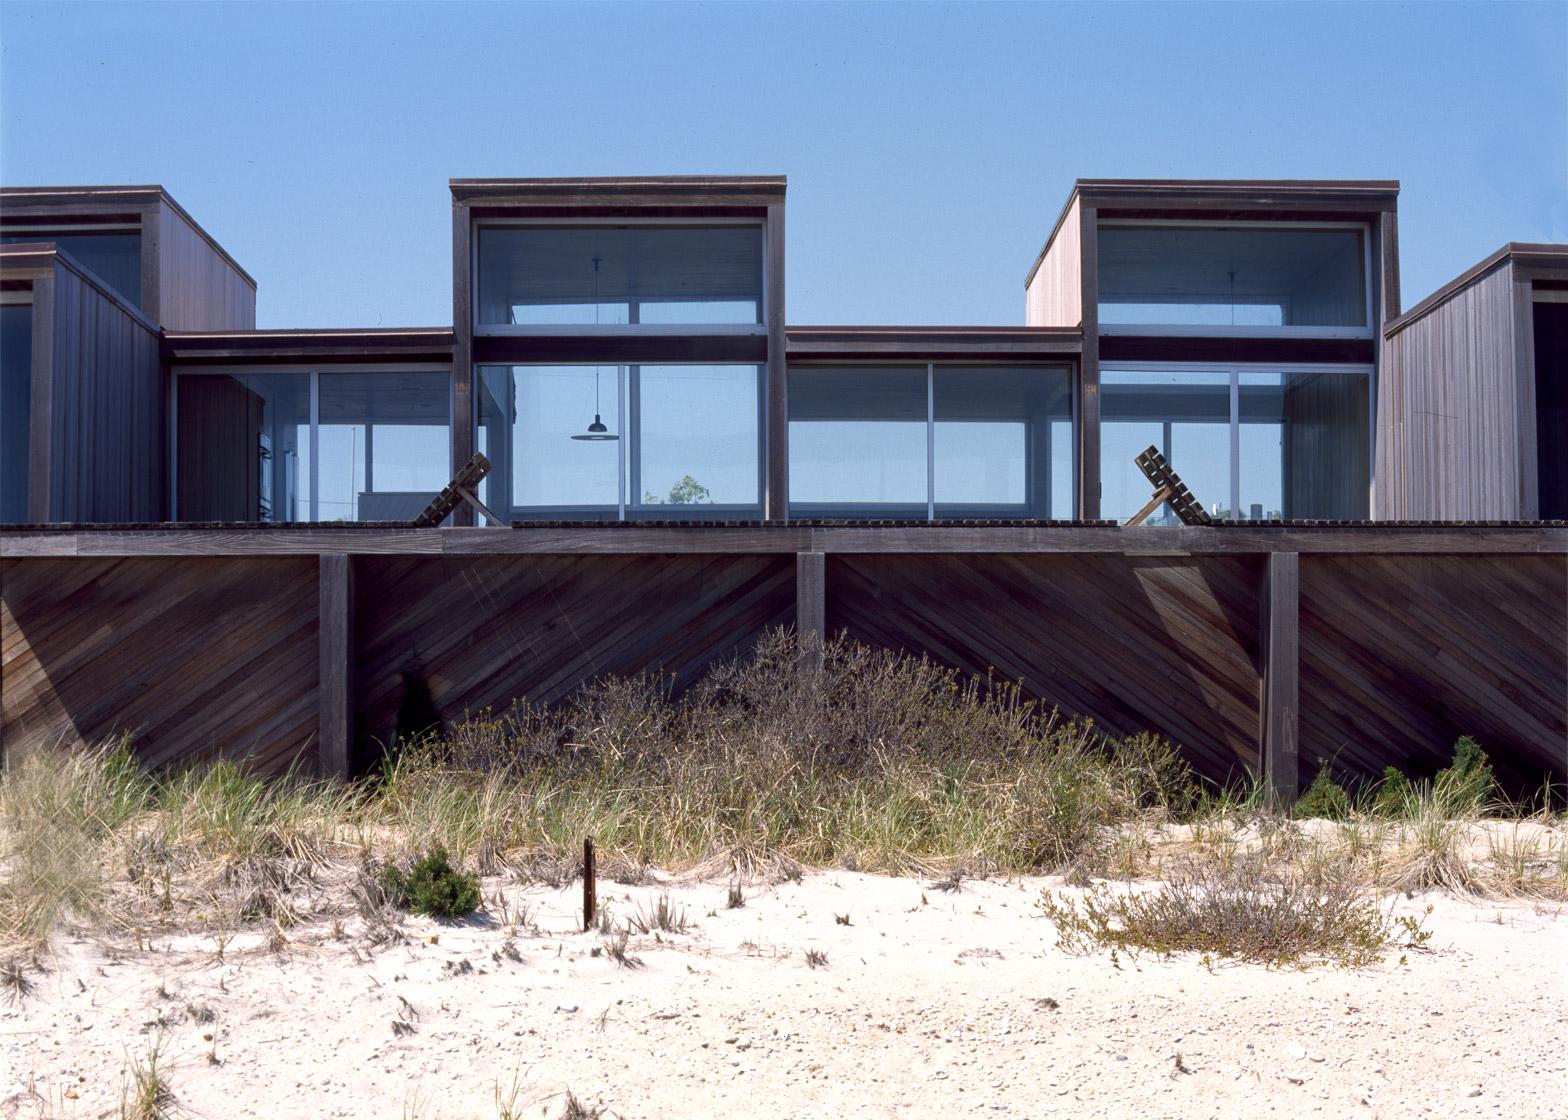 122 Ocean Walk by Horace Gifford, 1970